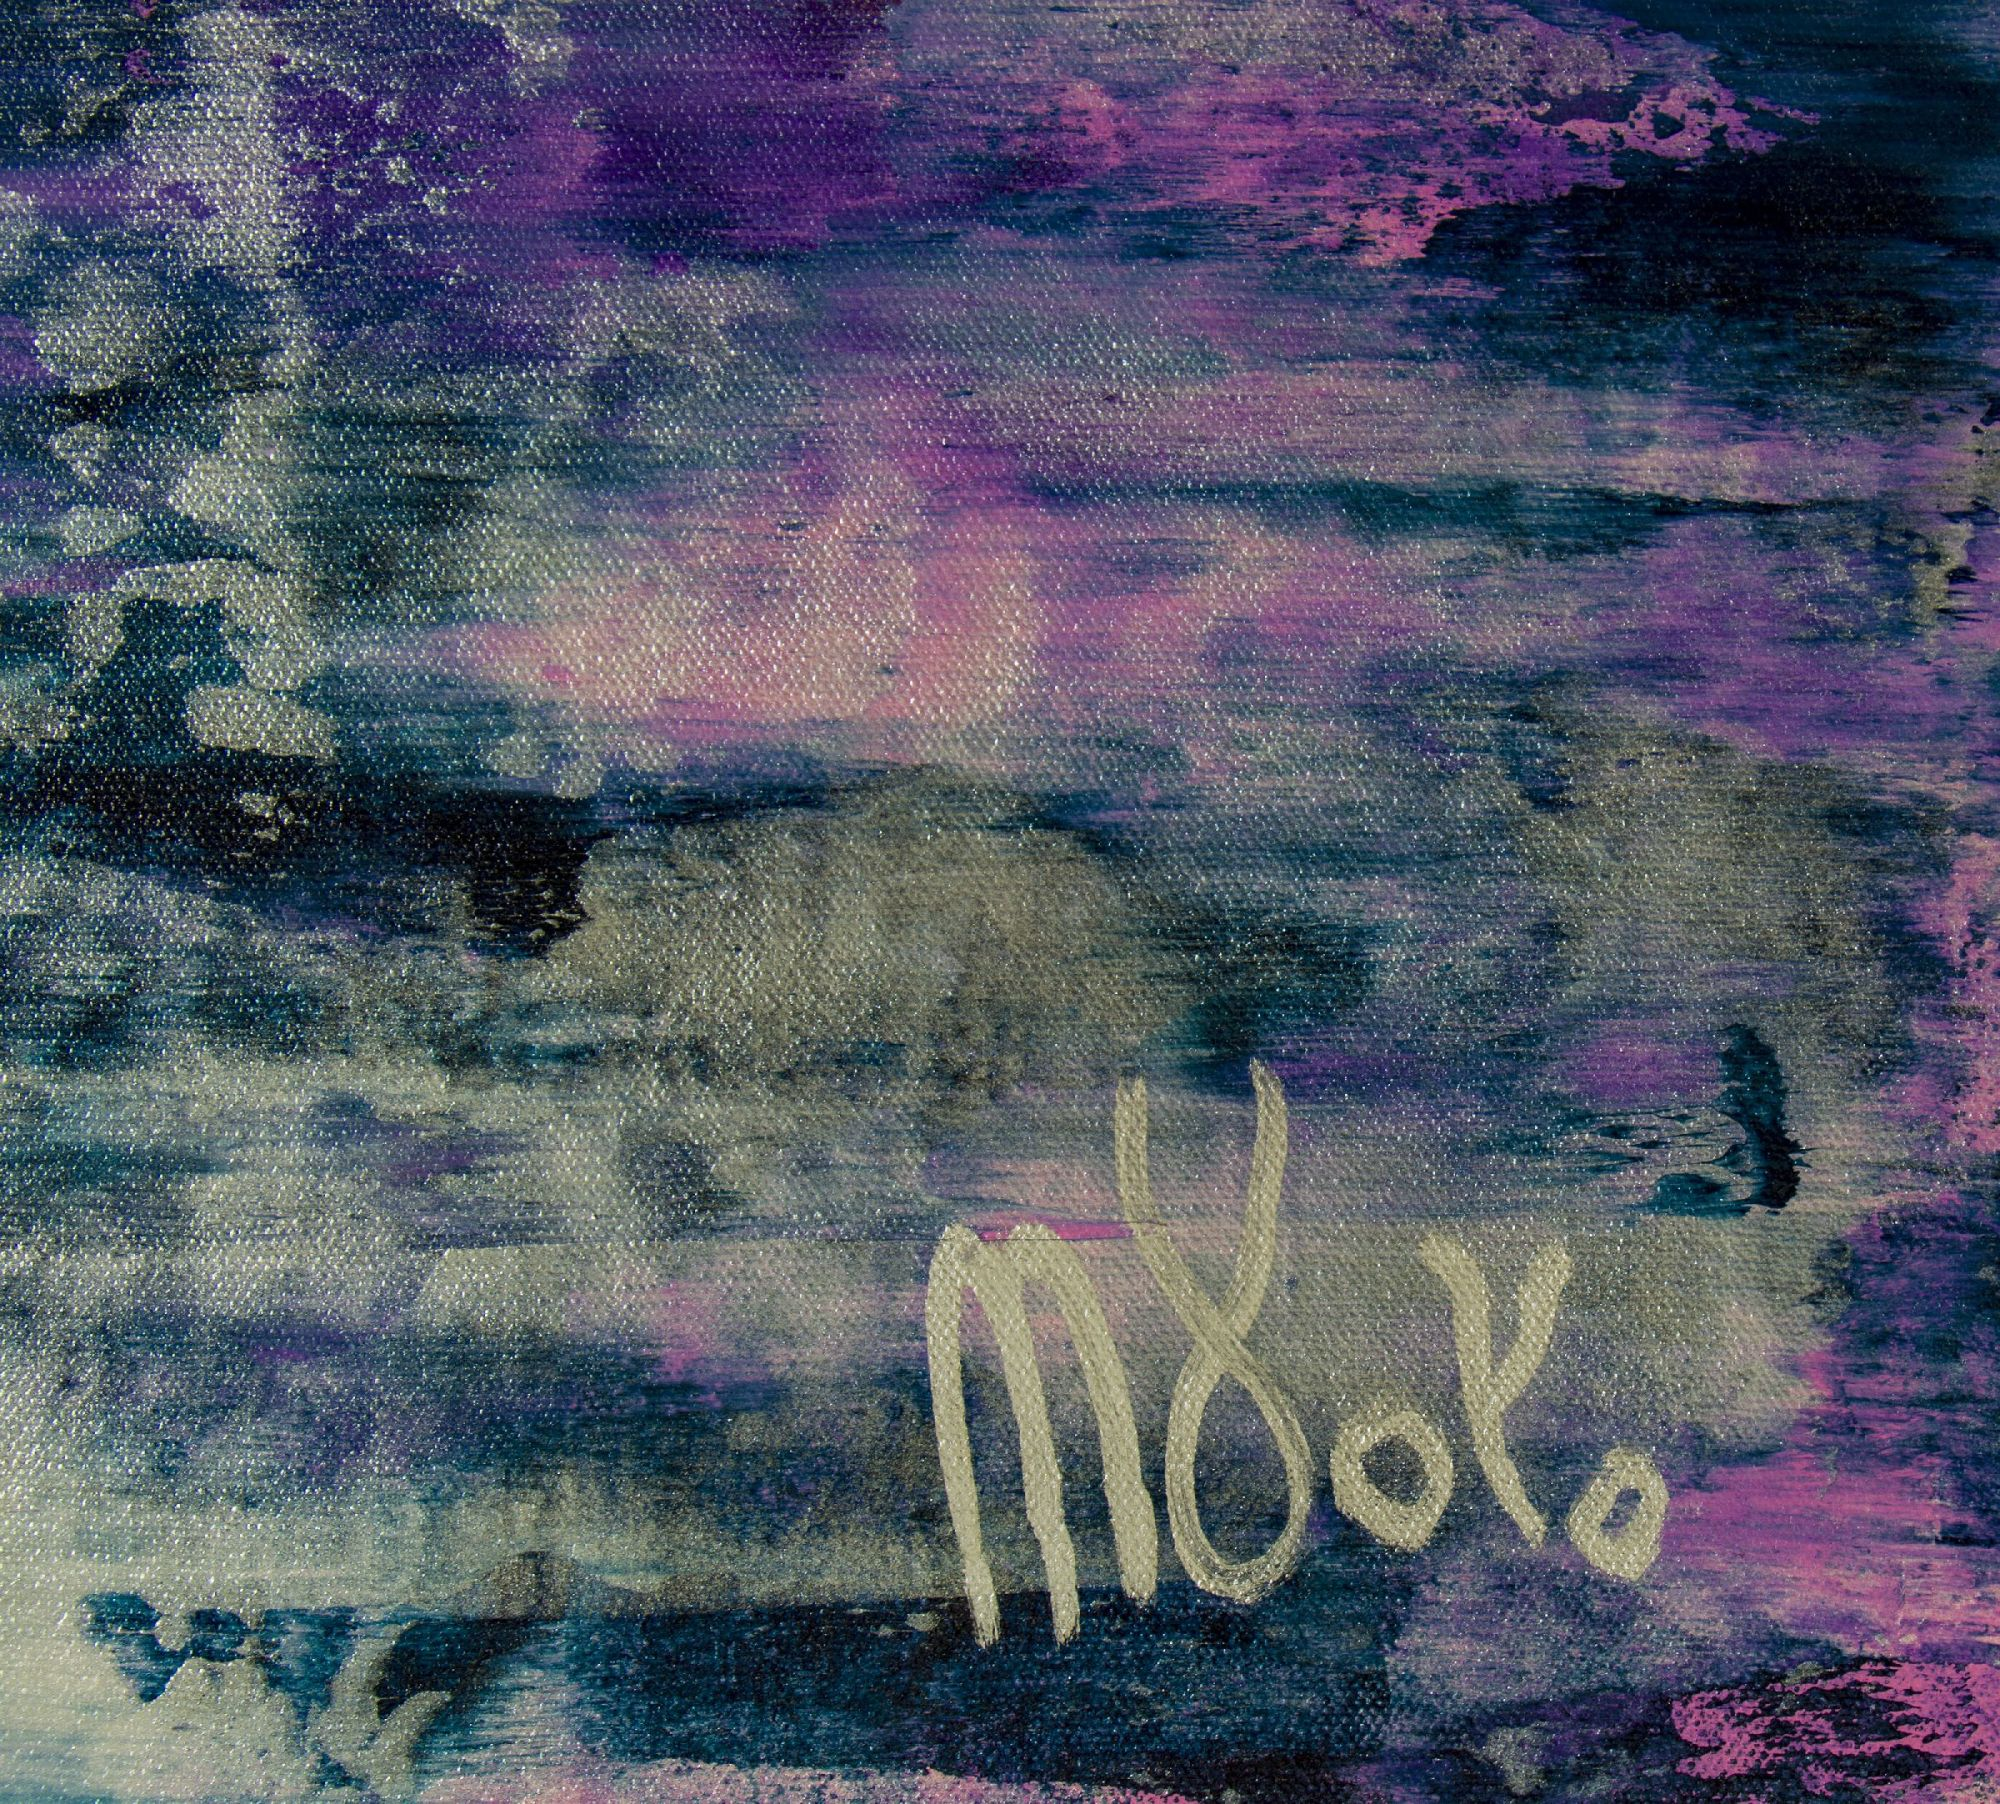 Signature / Silver Clouds (Over Purple) / (2020) by Nestor Toro